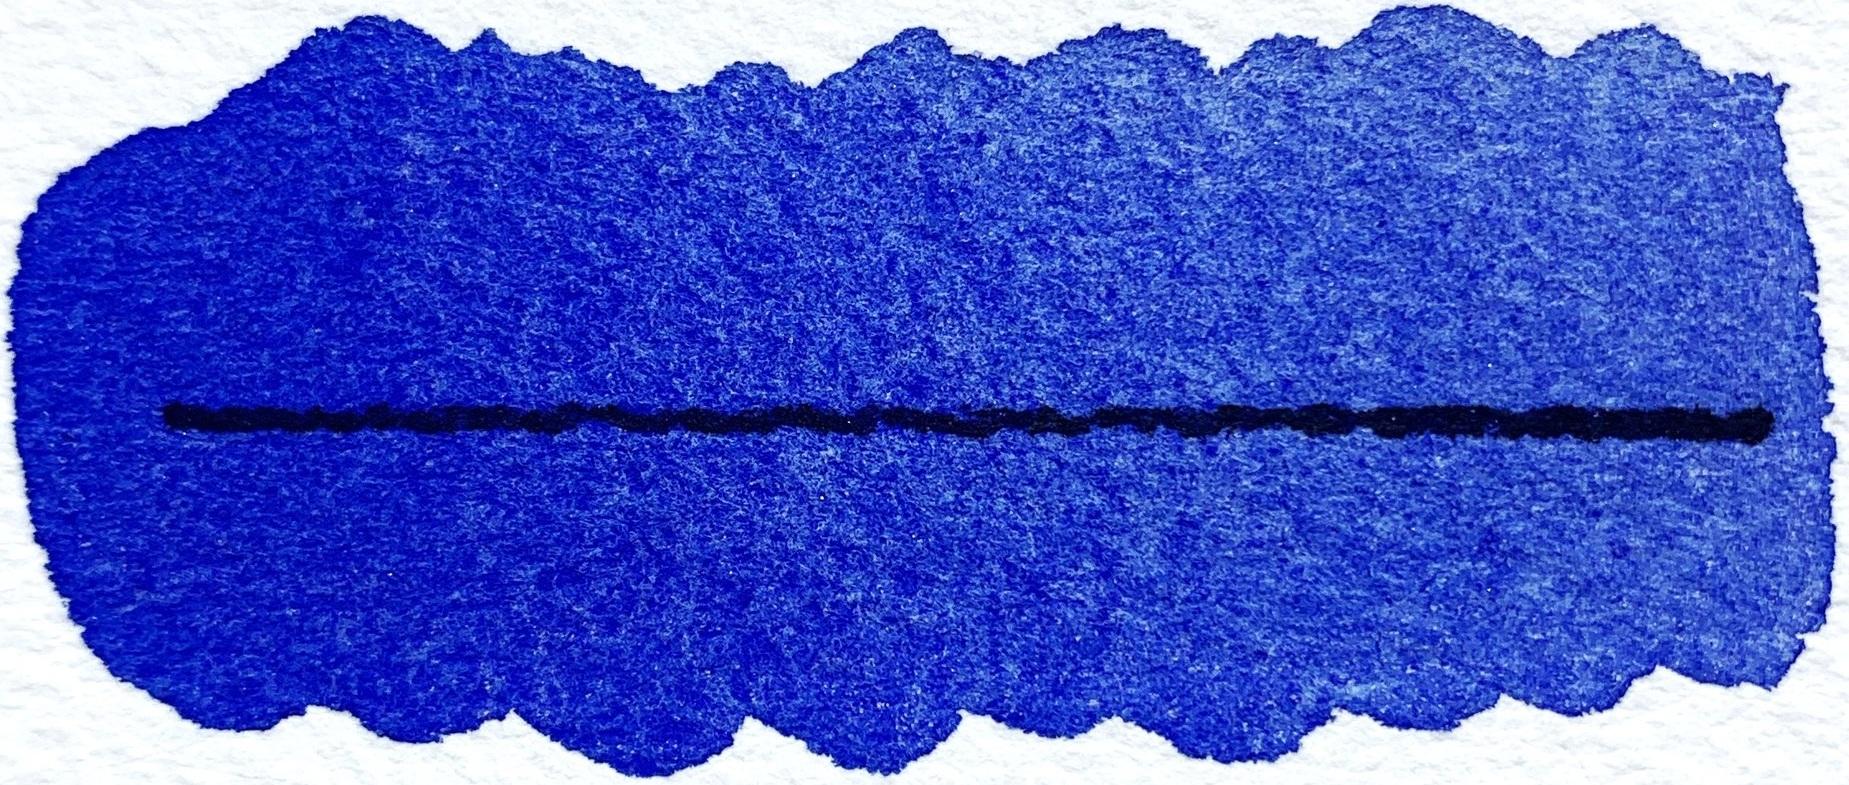 Ultramarine Blue - PB29, semitransparent, excellent lightfastness, staining